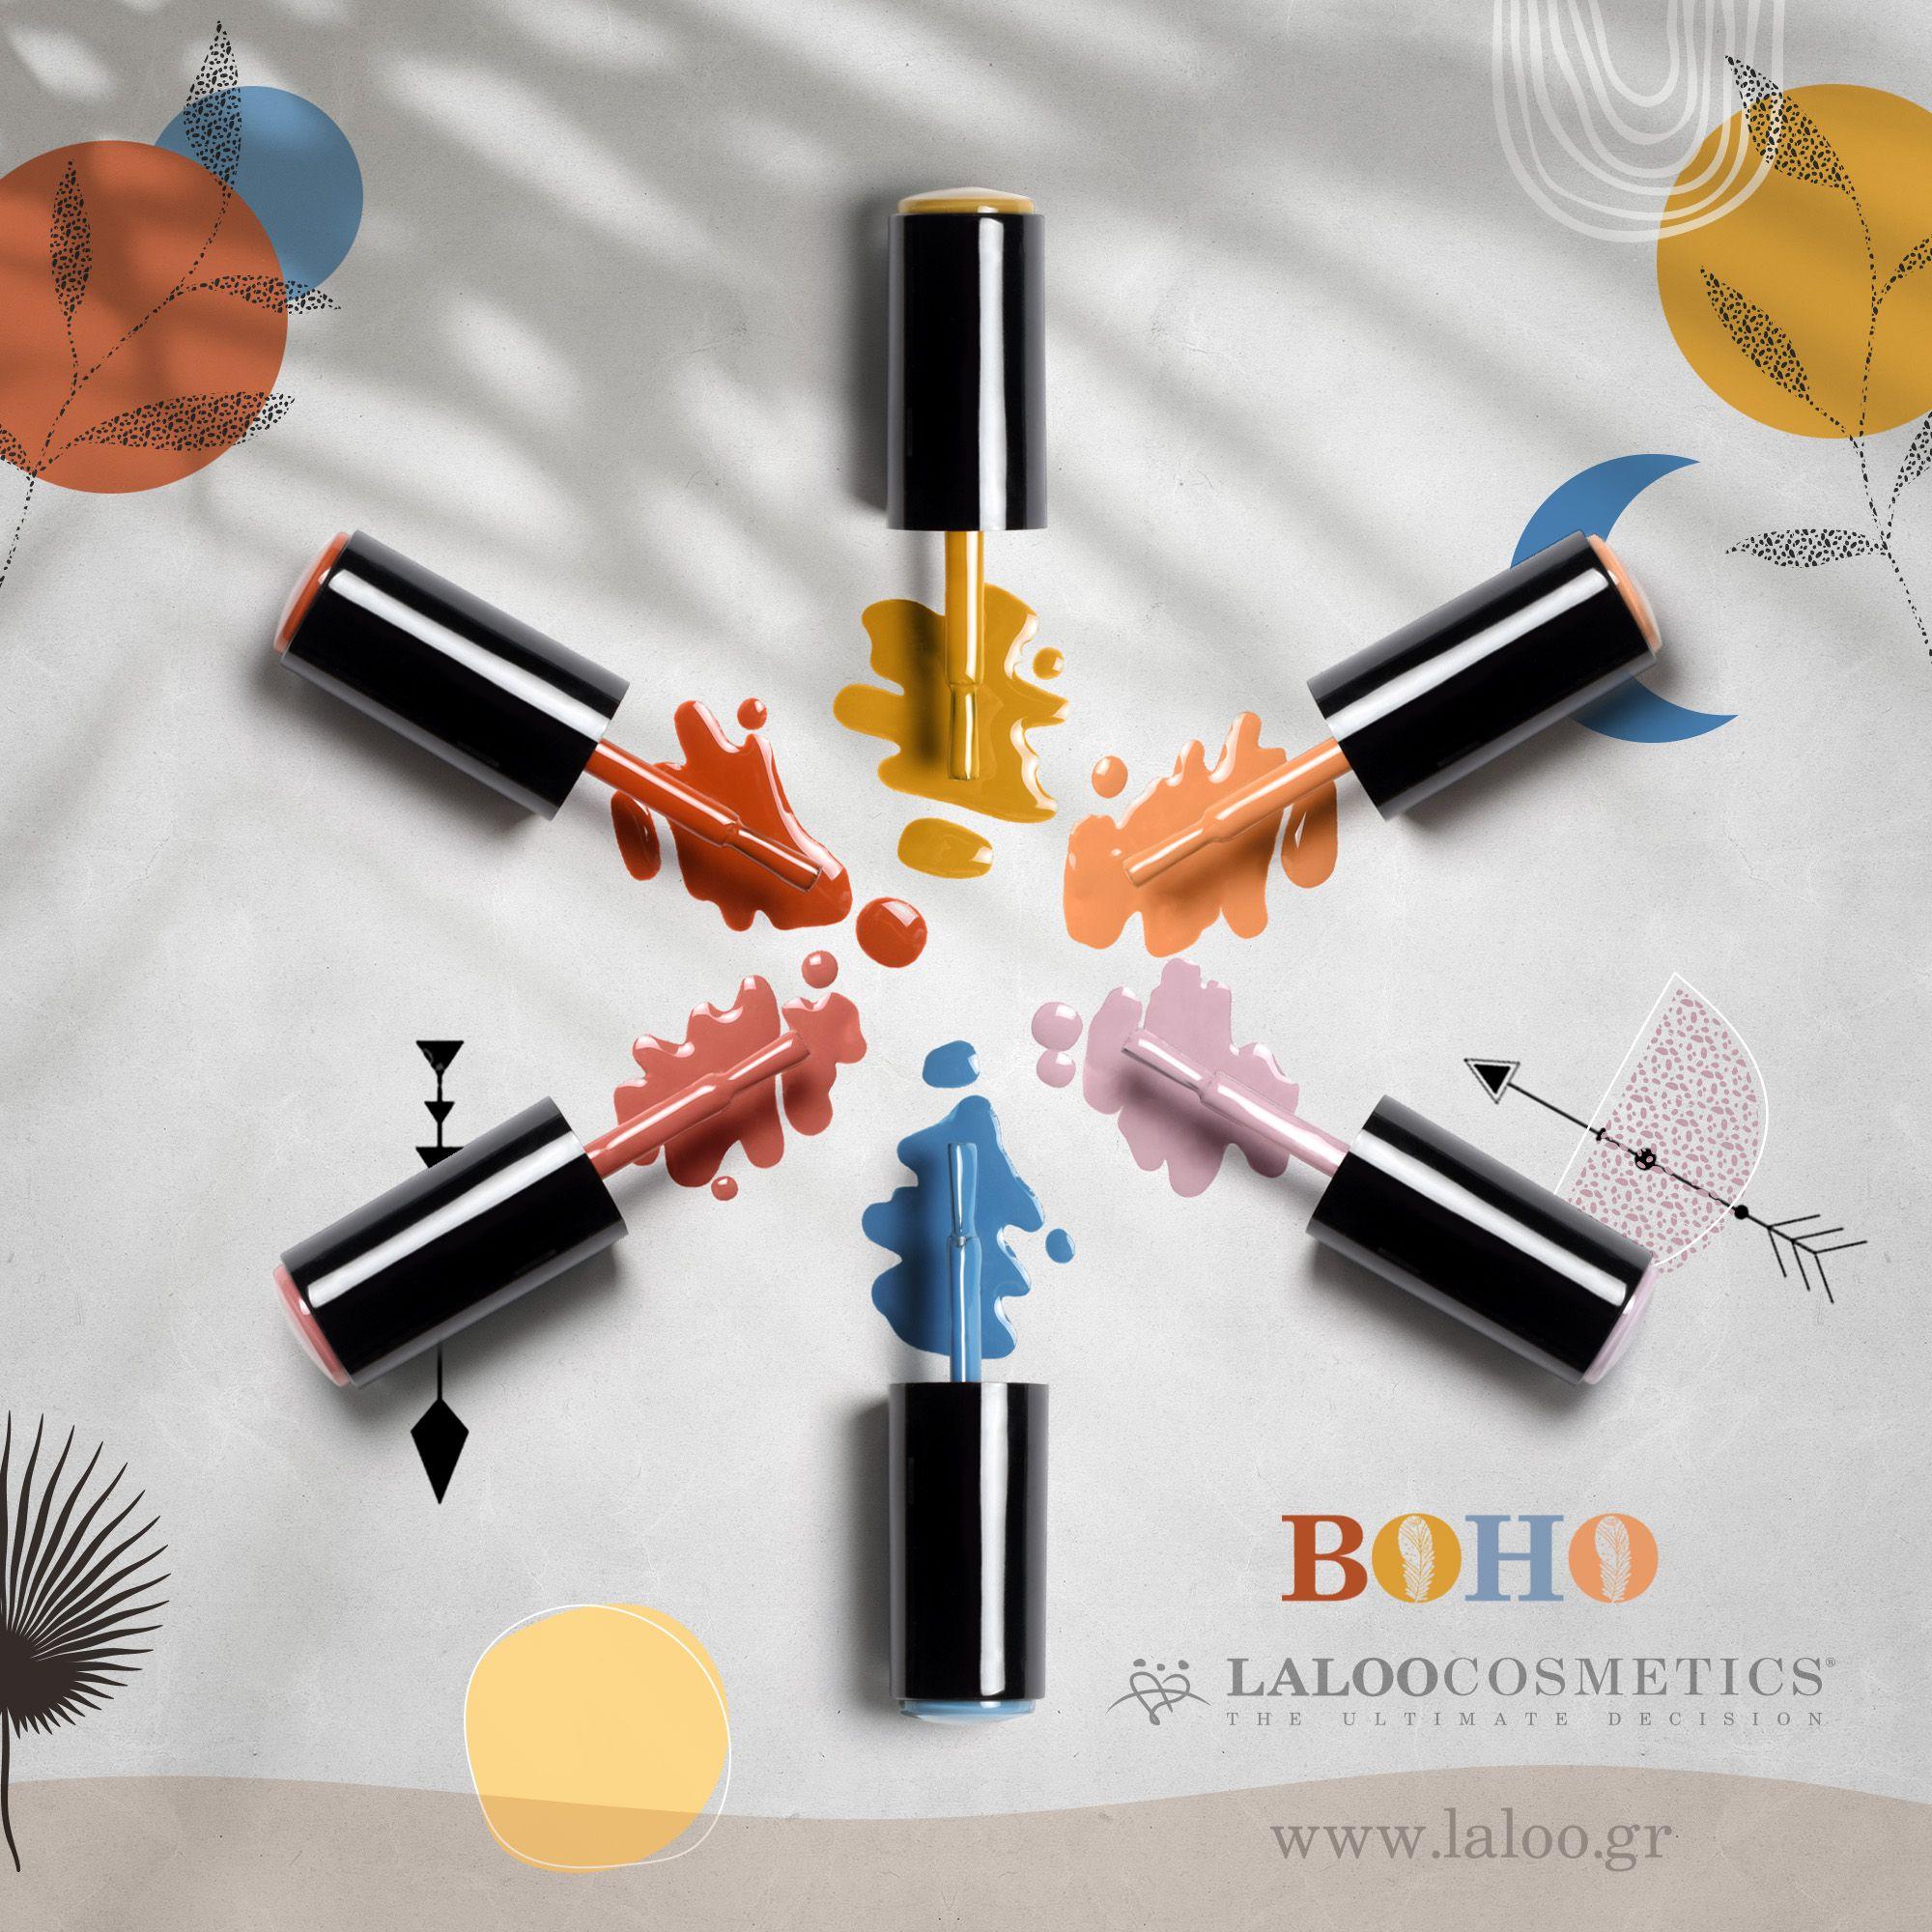 Laloo Cosmetics Boho Collection